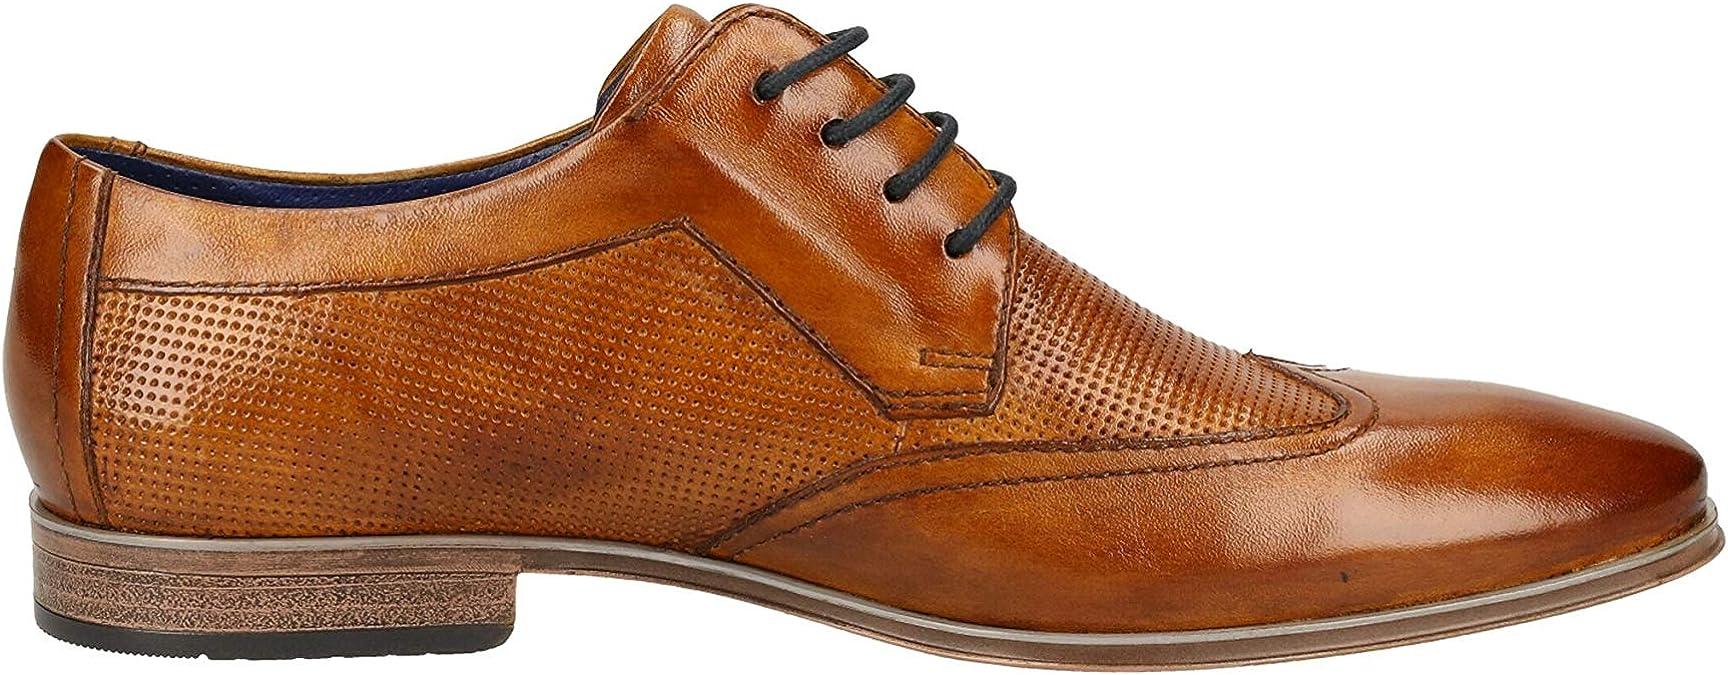 Bugatti Martin Hommes Chaussures Basses Chaussure Lacée Business 311-26261-1010-6341 Marron